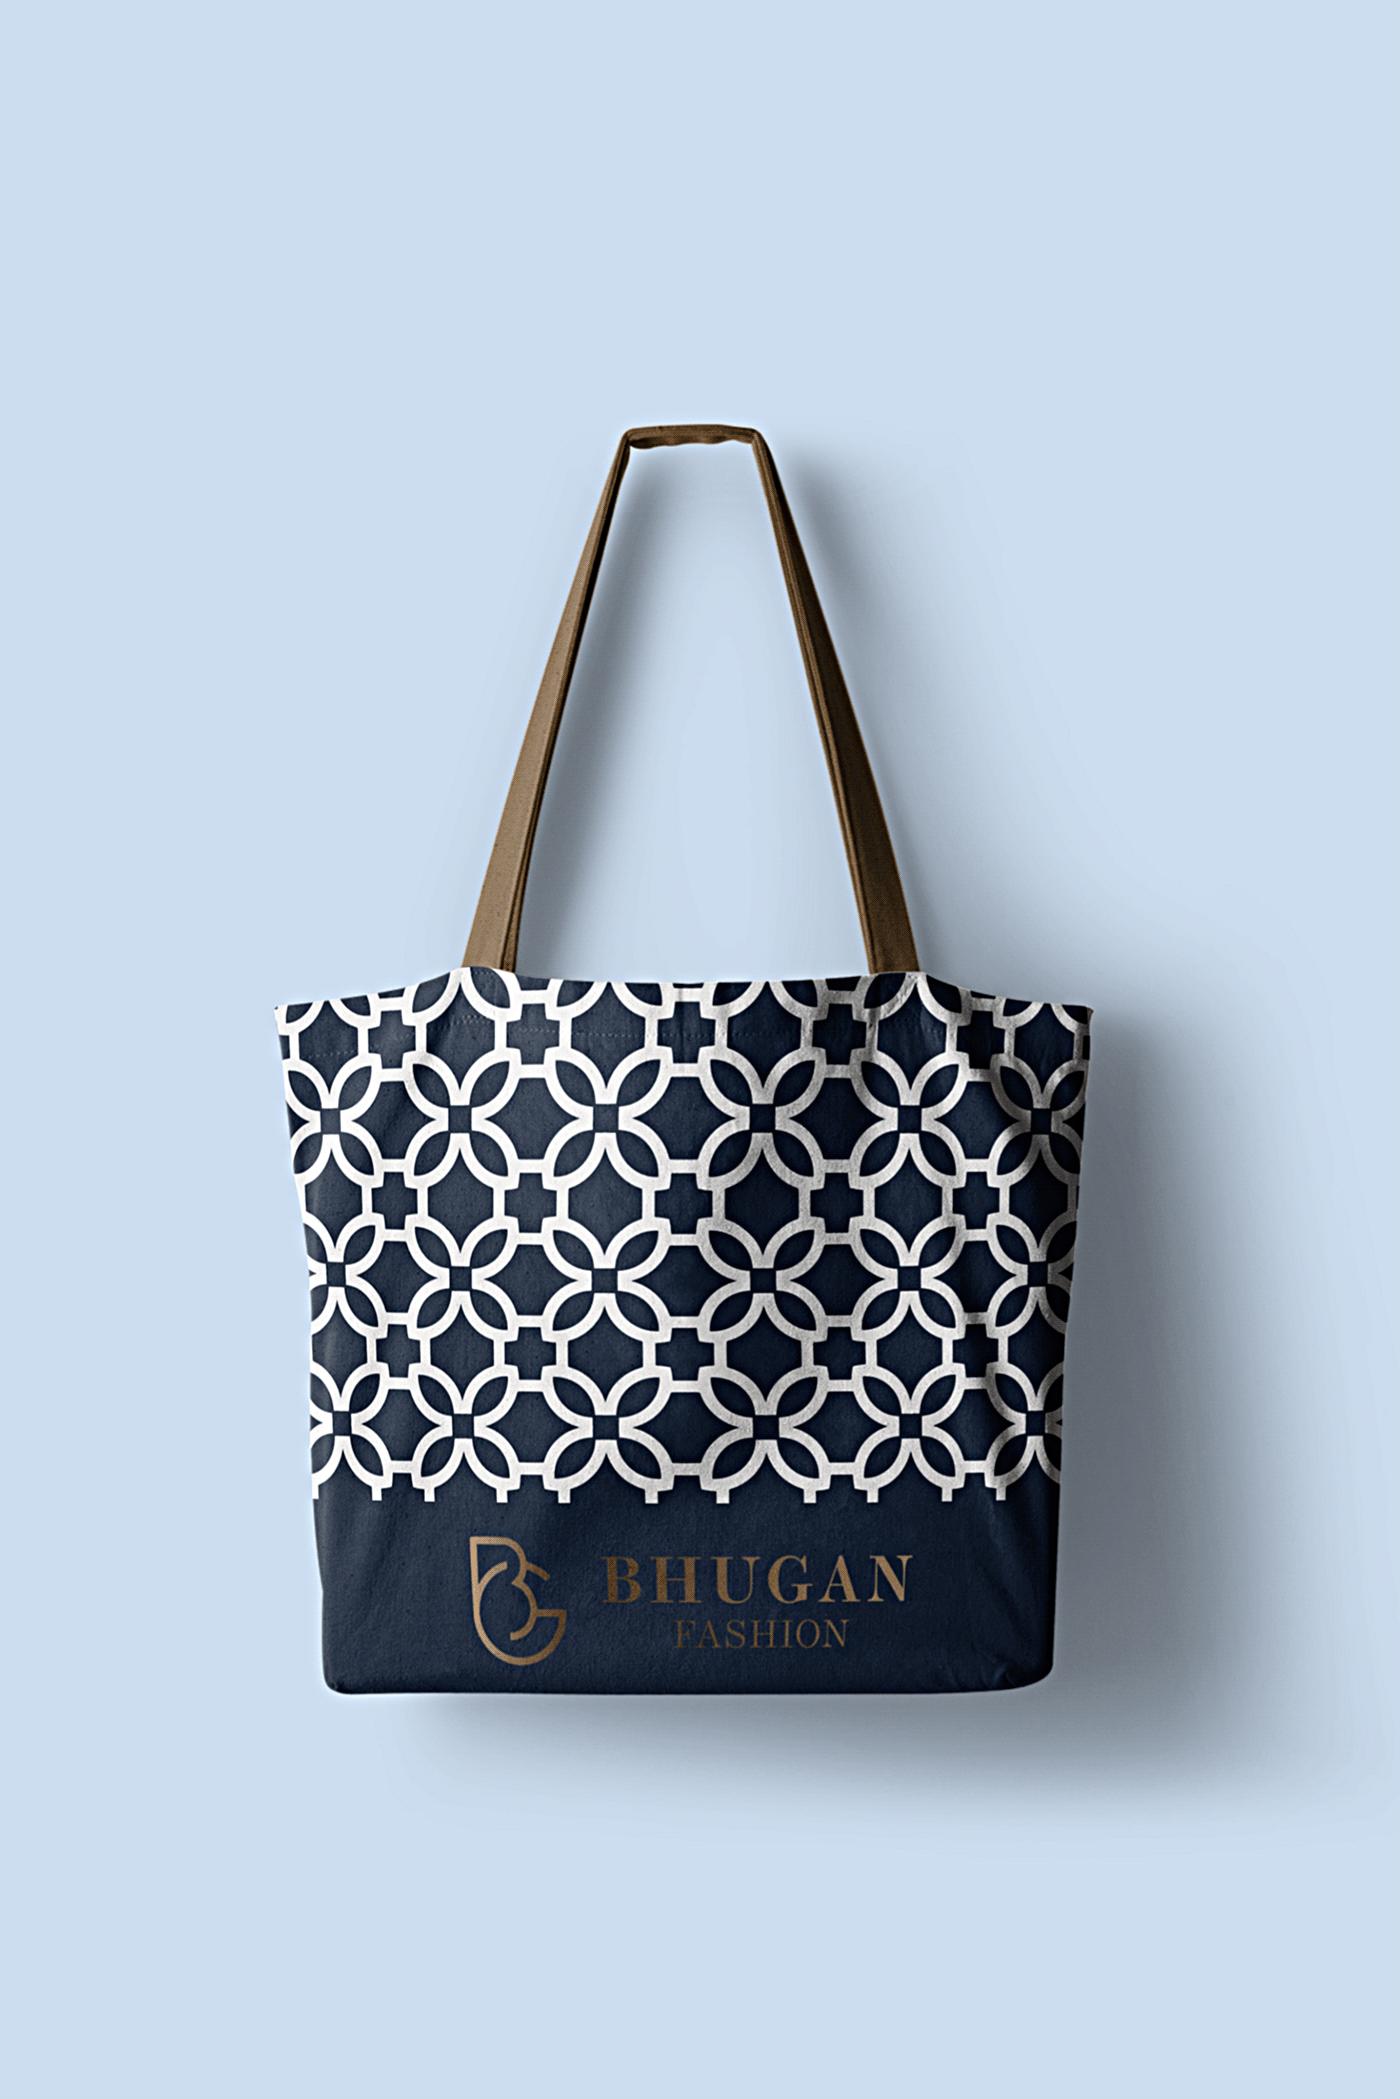 Image may contain: handbag, luggage and bags and bag